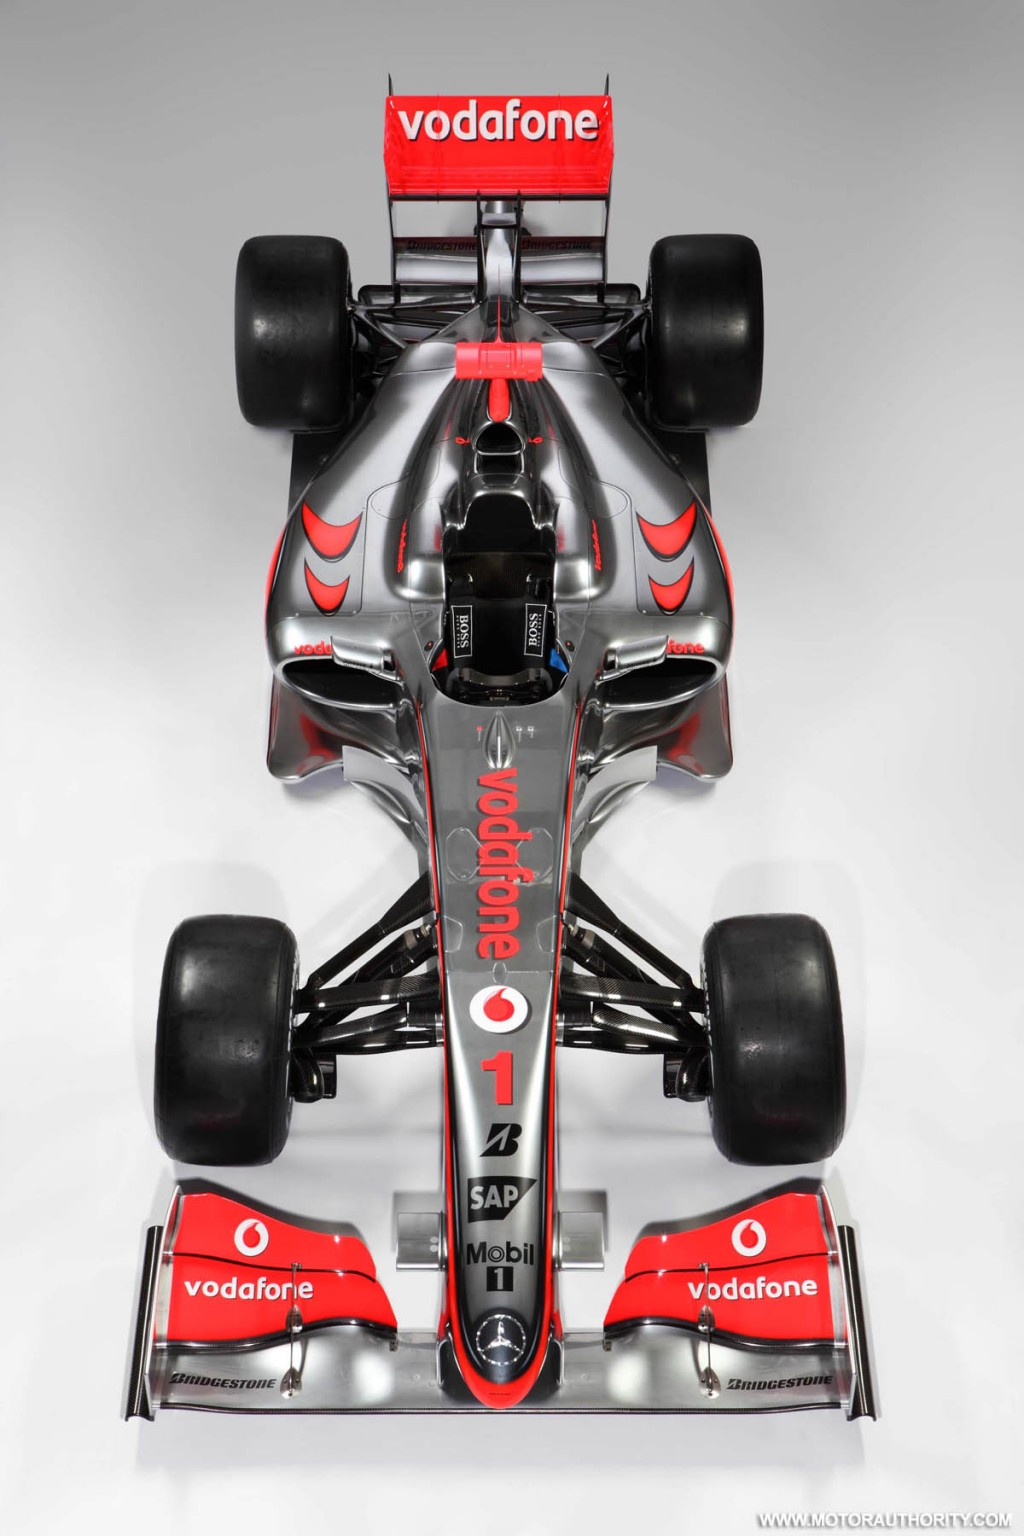 mclaren mp4 24 2009 f1 race car 002